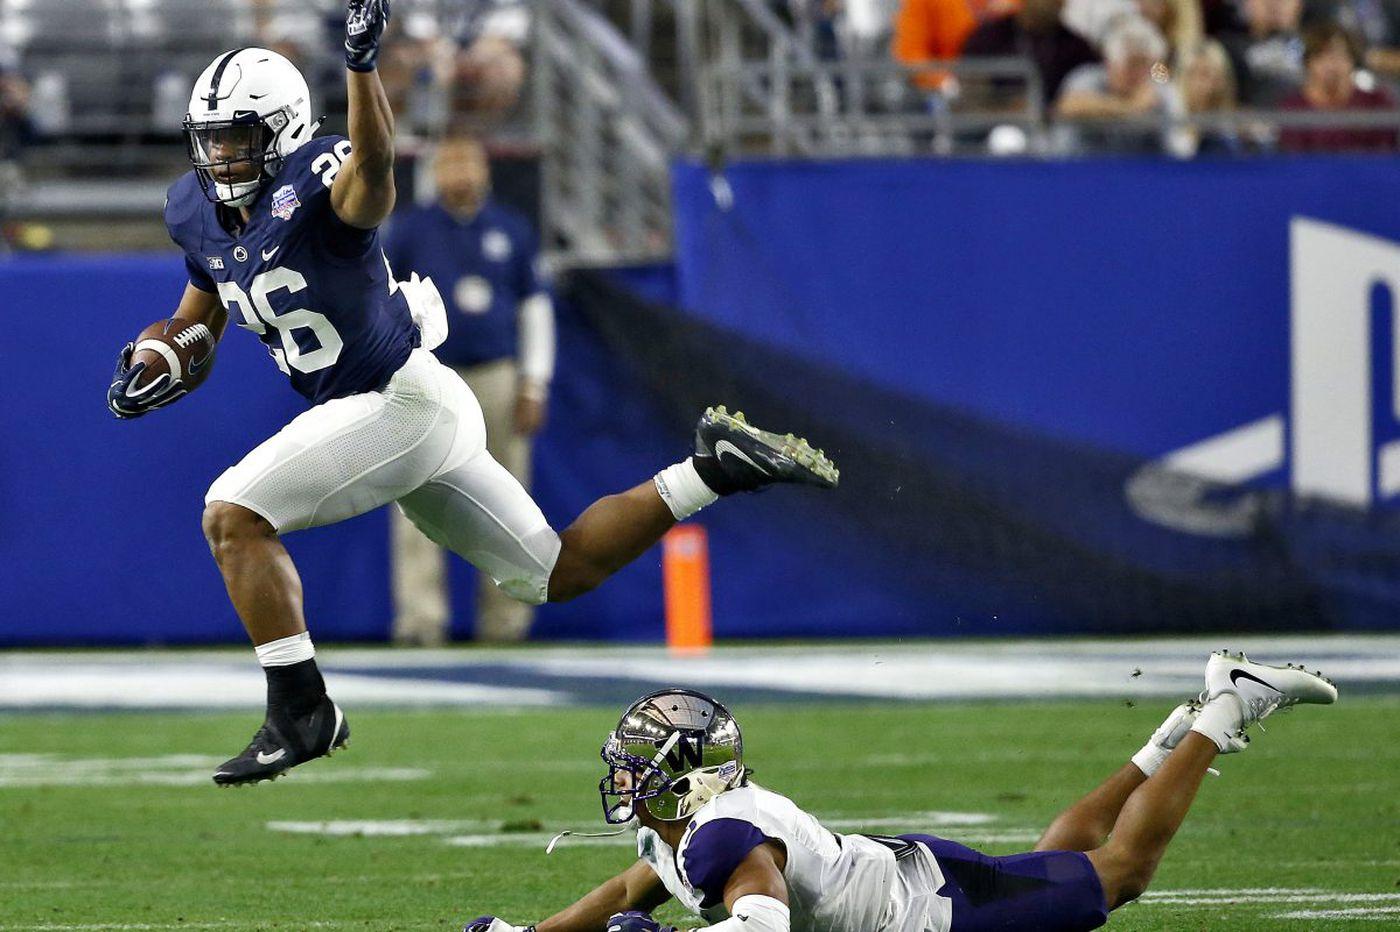 Penn State 35, Washington 28: Saquon Barkley, Trace McSorley lead Fiesta Bowl victory over Huskies